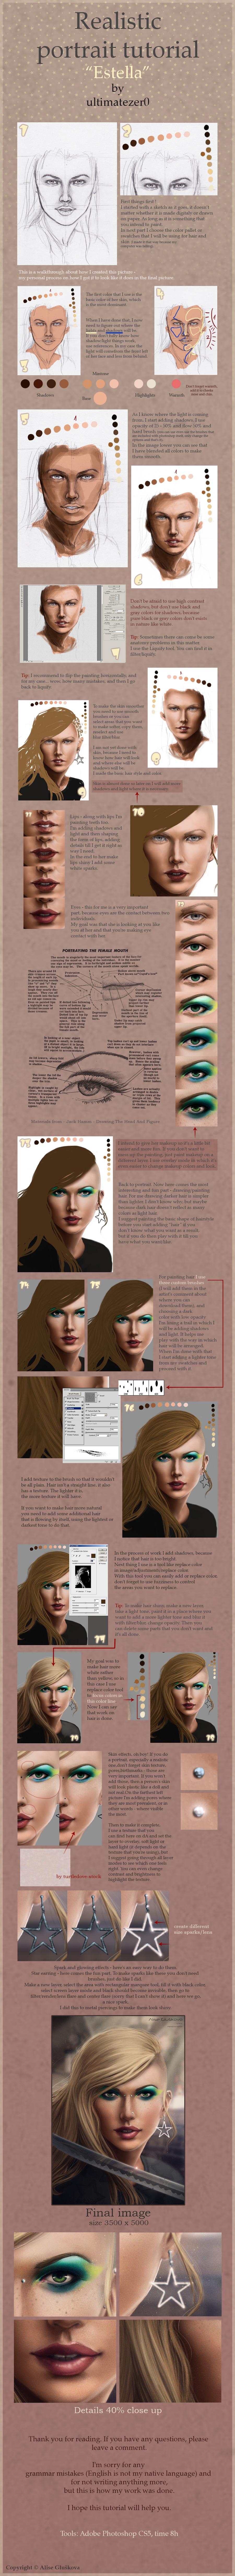 Realistic portrait tutorial by nom-nom-pancake